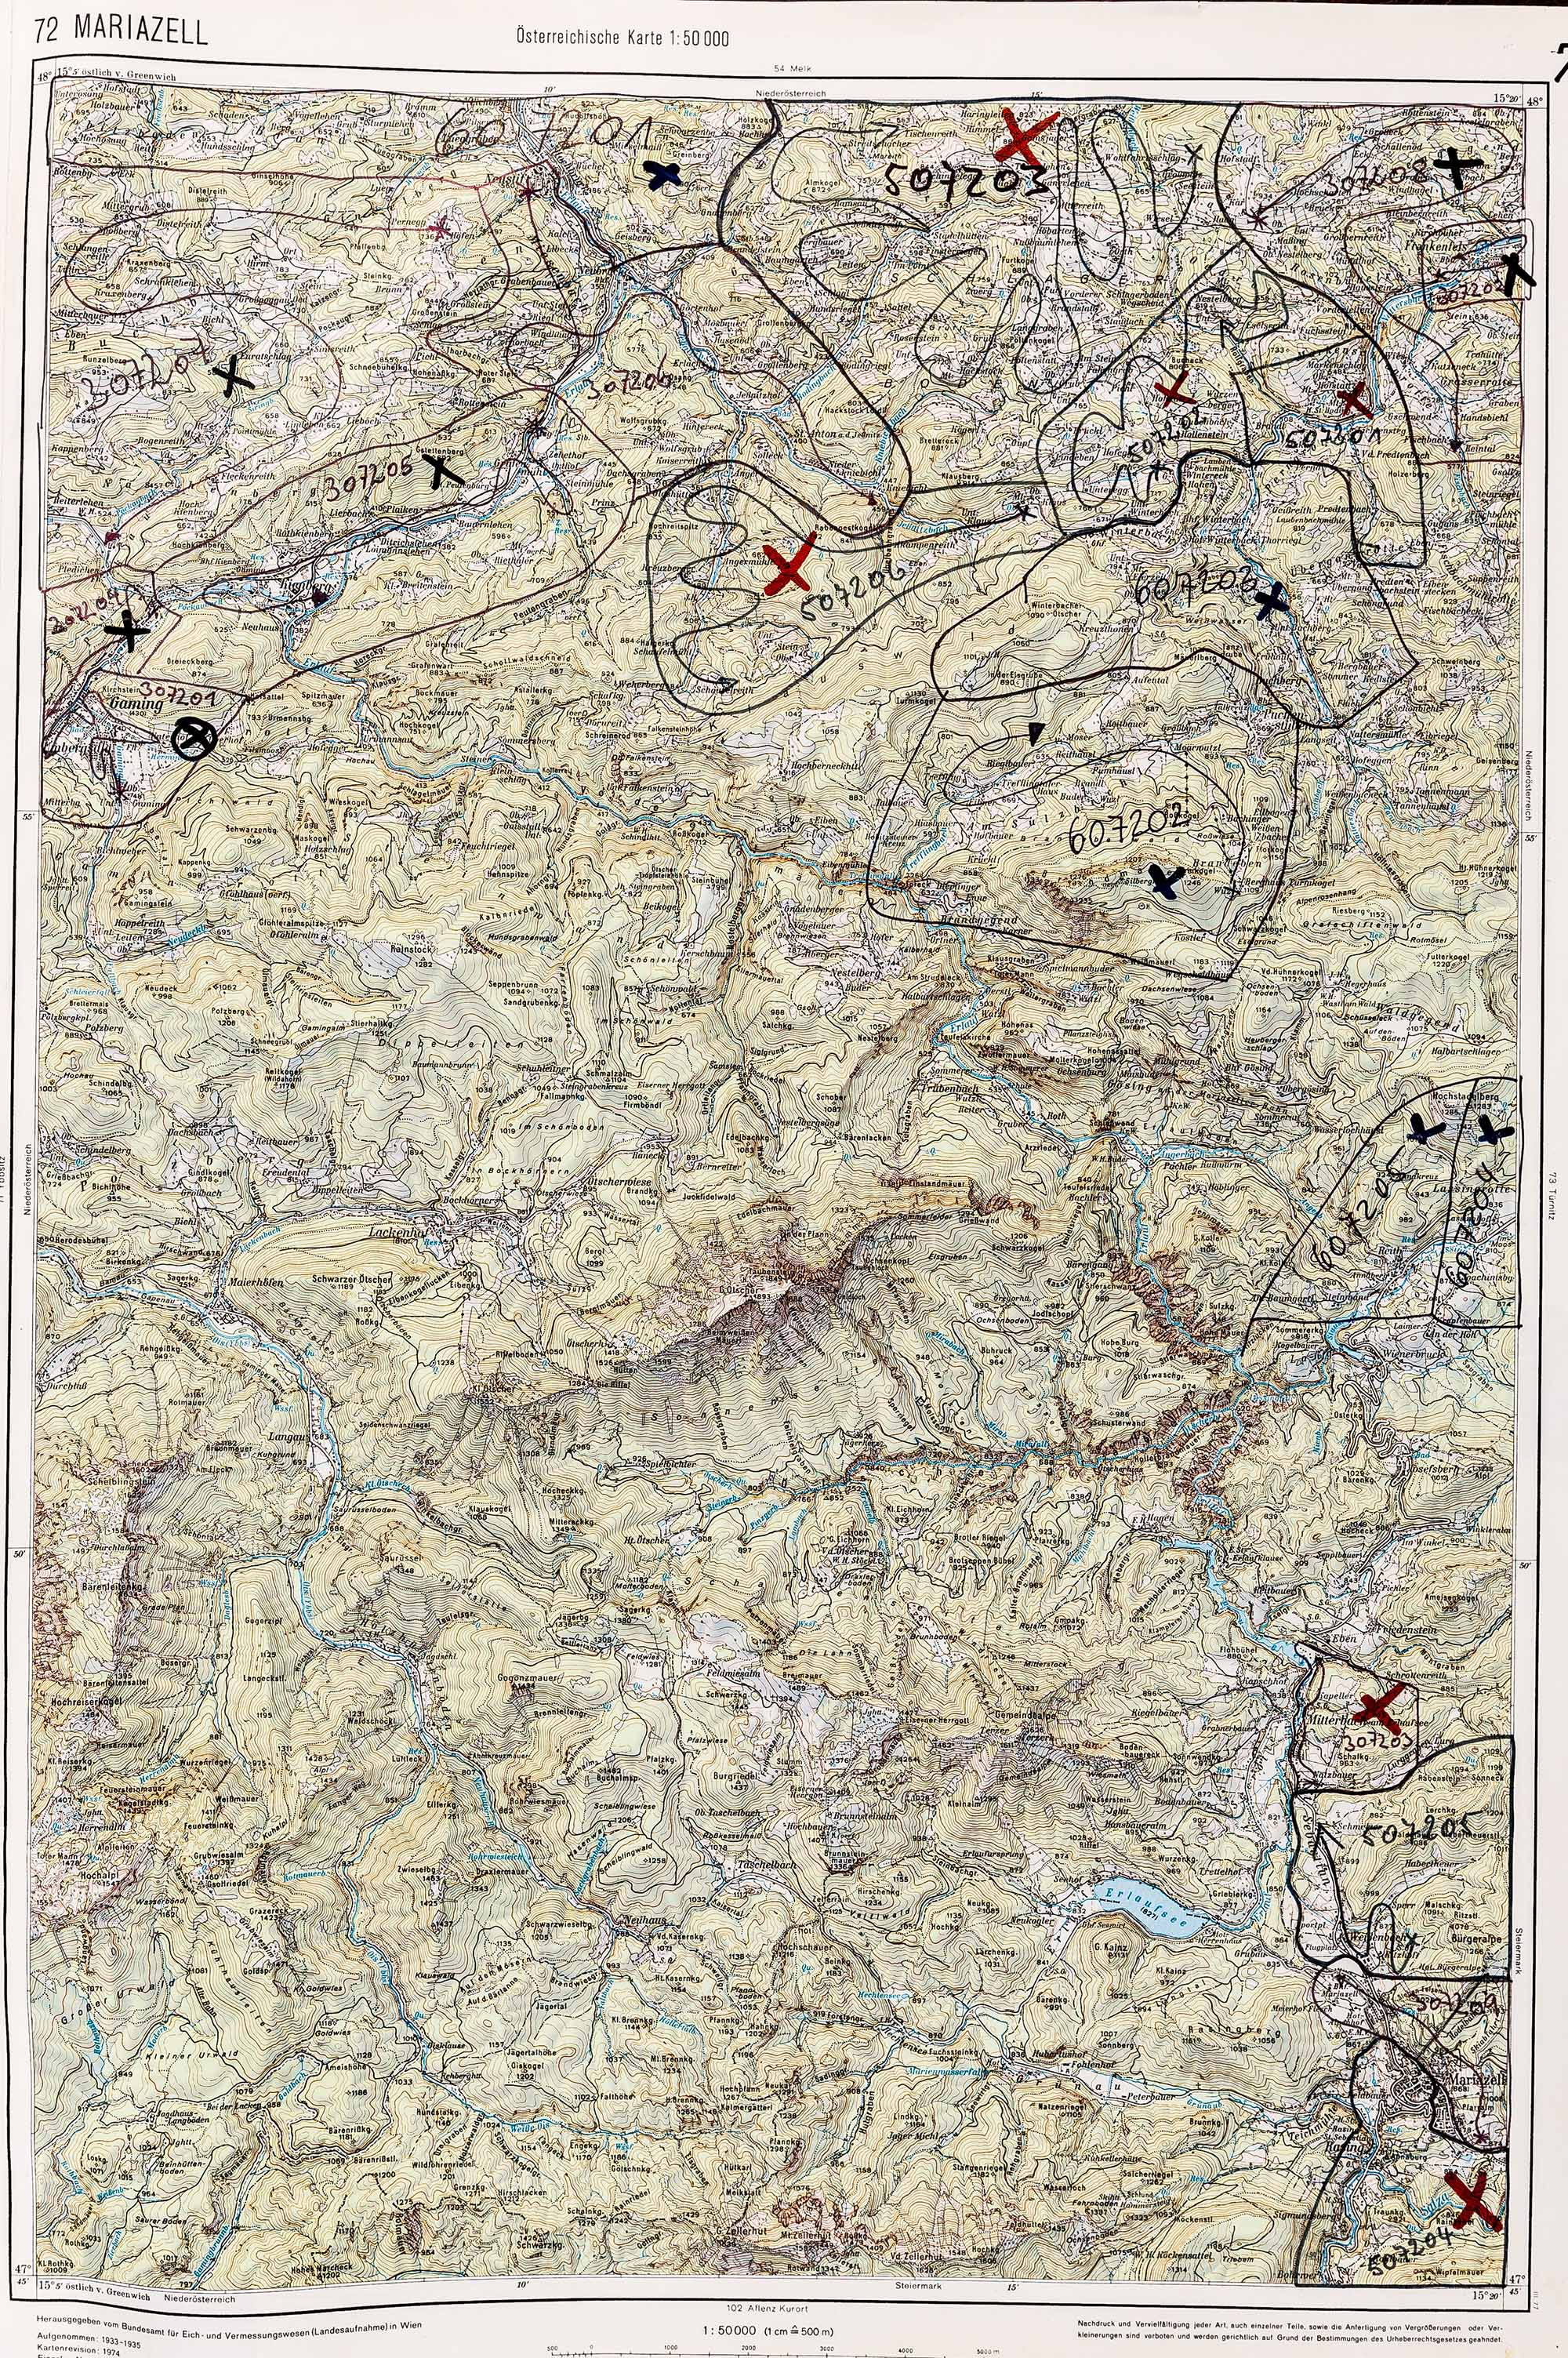 1983-1986 Karte 072